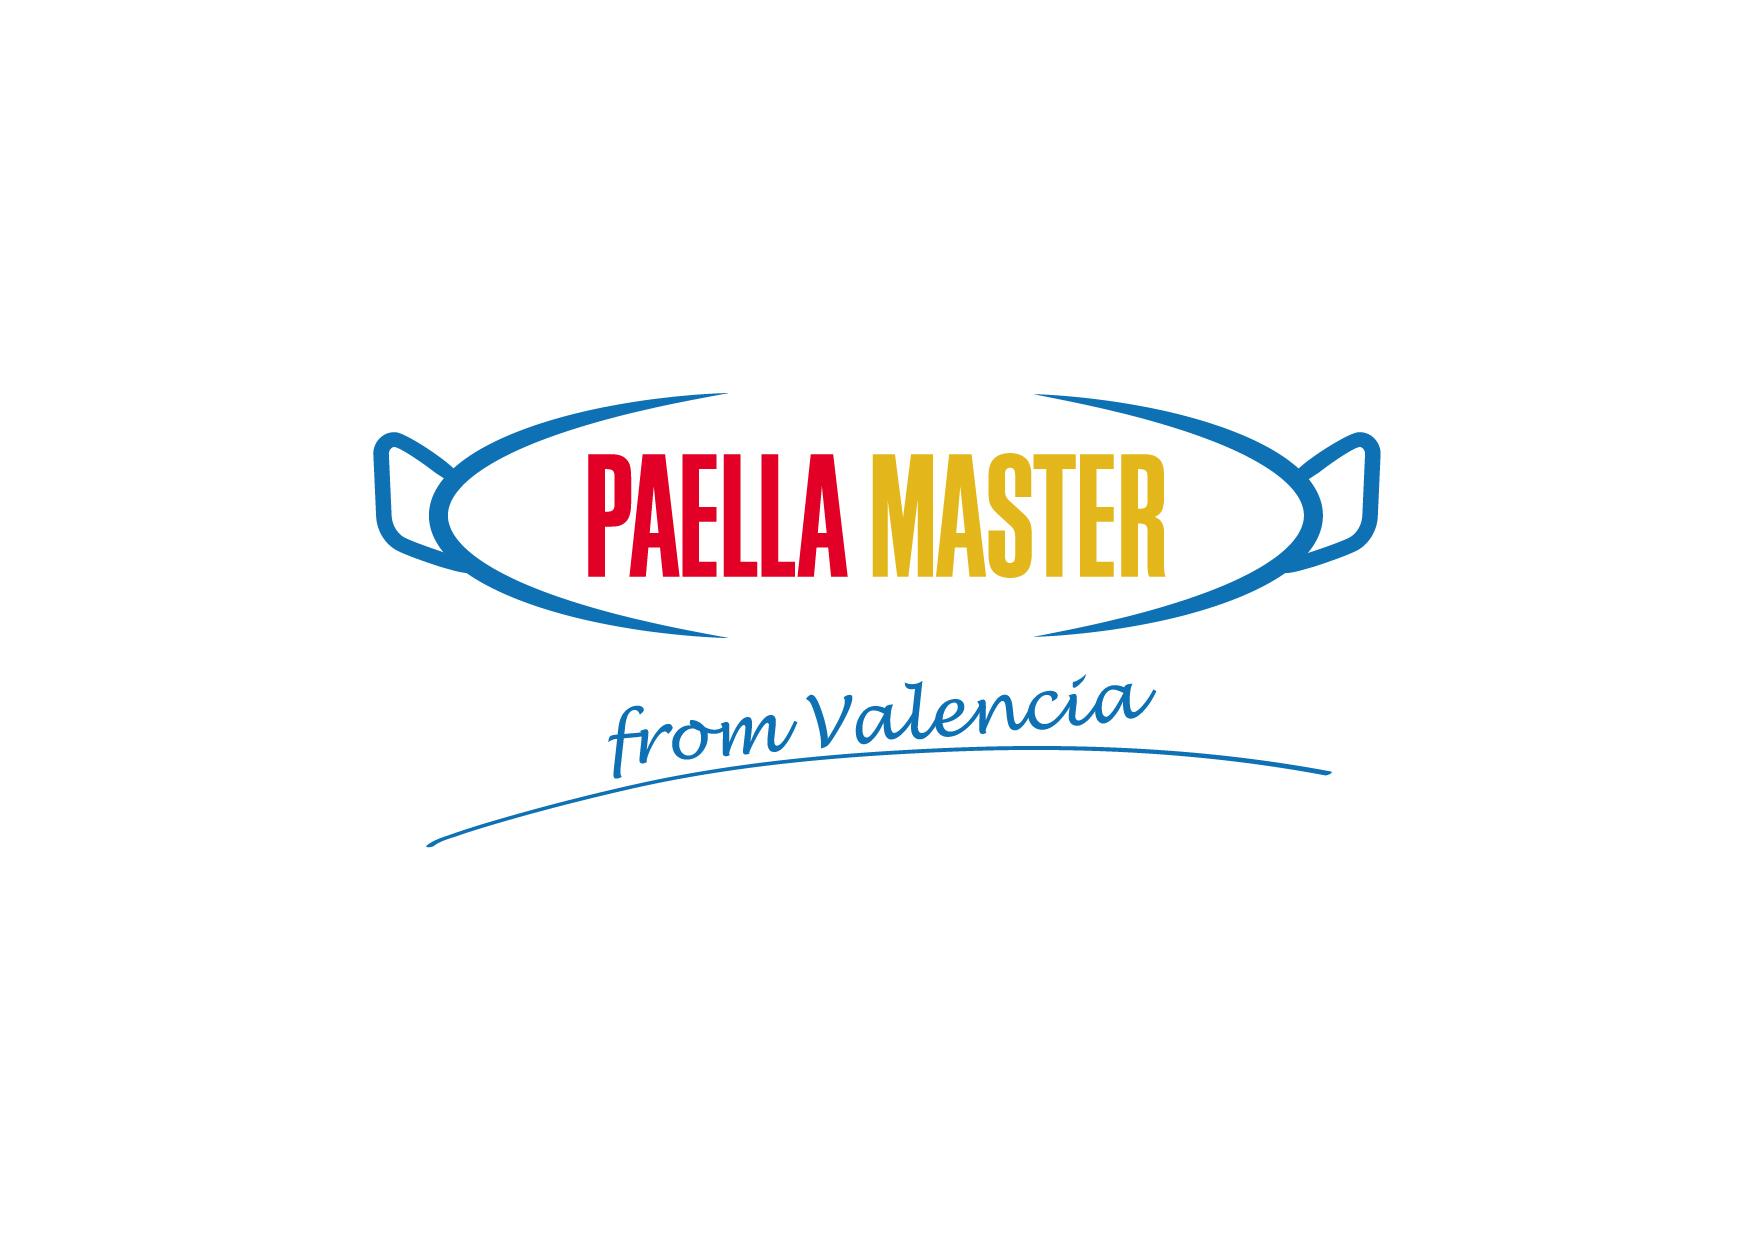 paella master